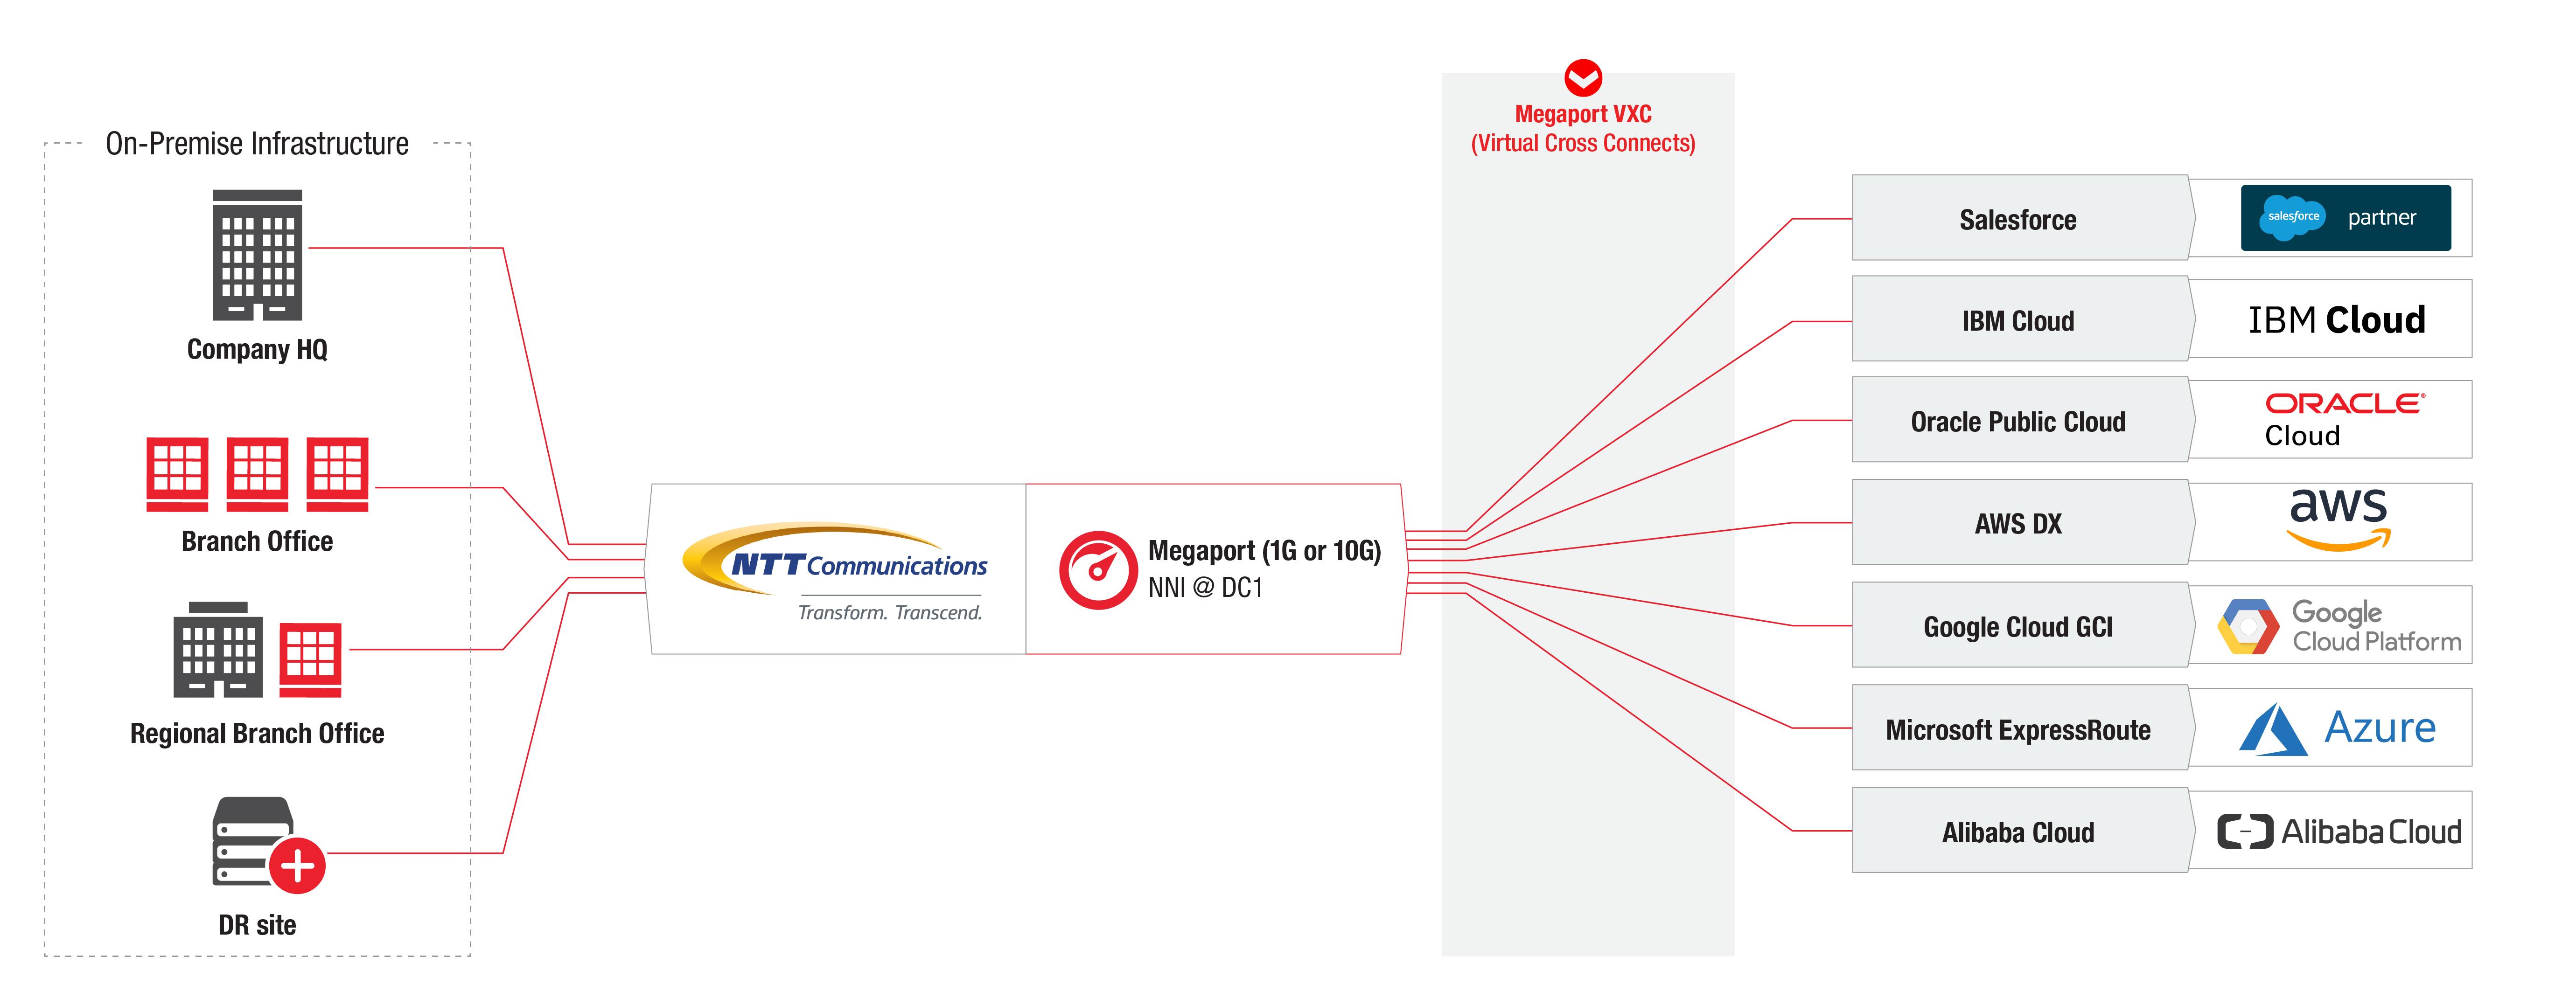 NTT Communications & Megaport SDN Diagram for Multi Cloud